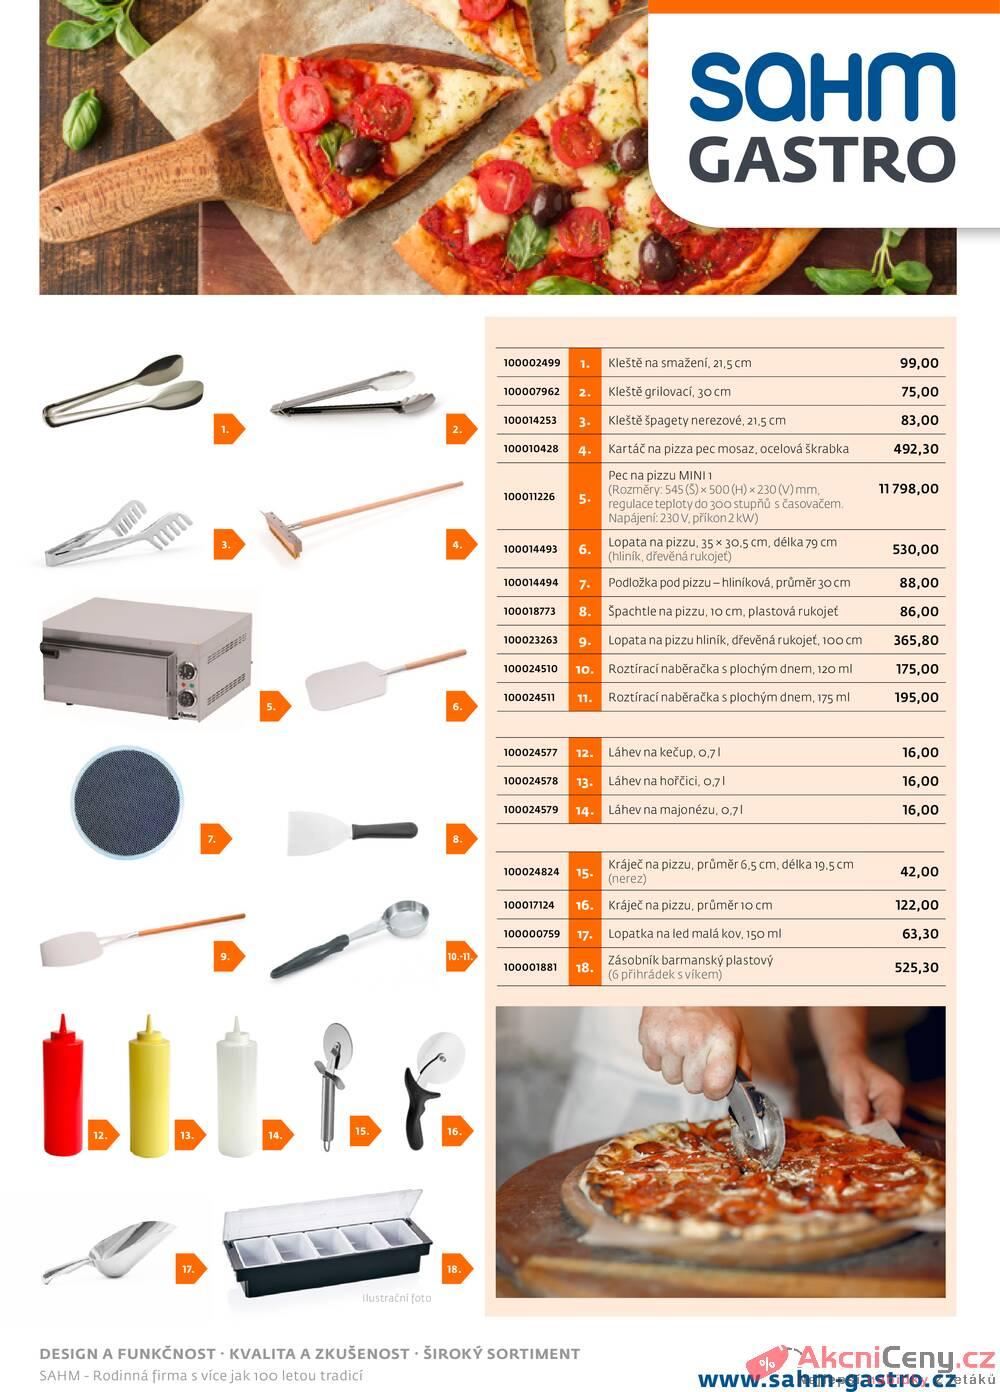 Leták Sahm Gastro - Sahm Gastro od 20.5. do 20.6.2020 - strana 1